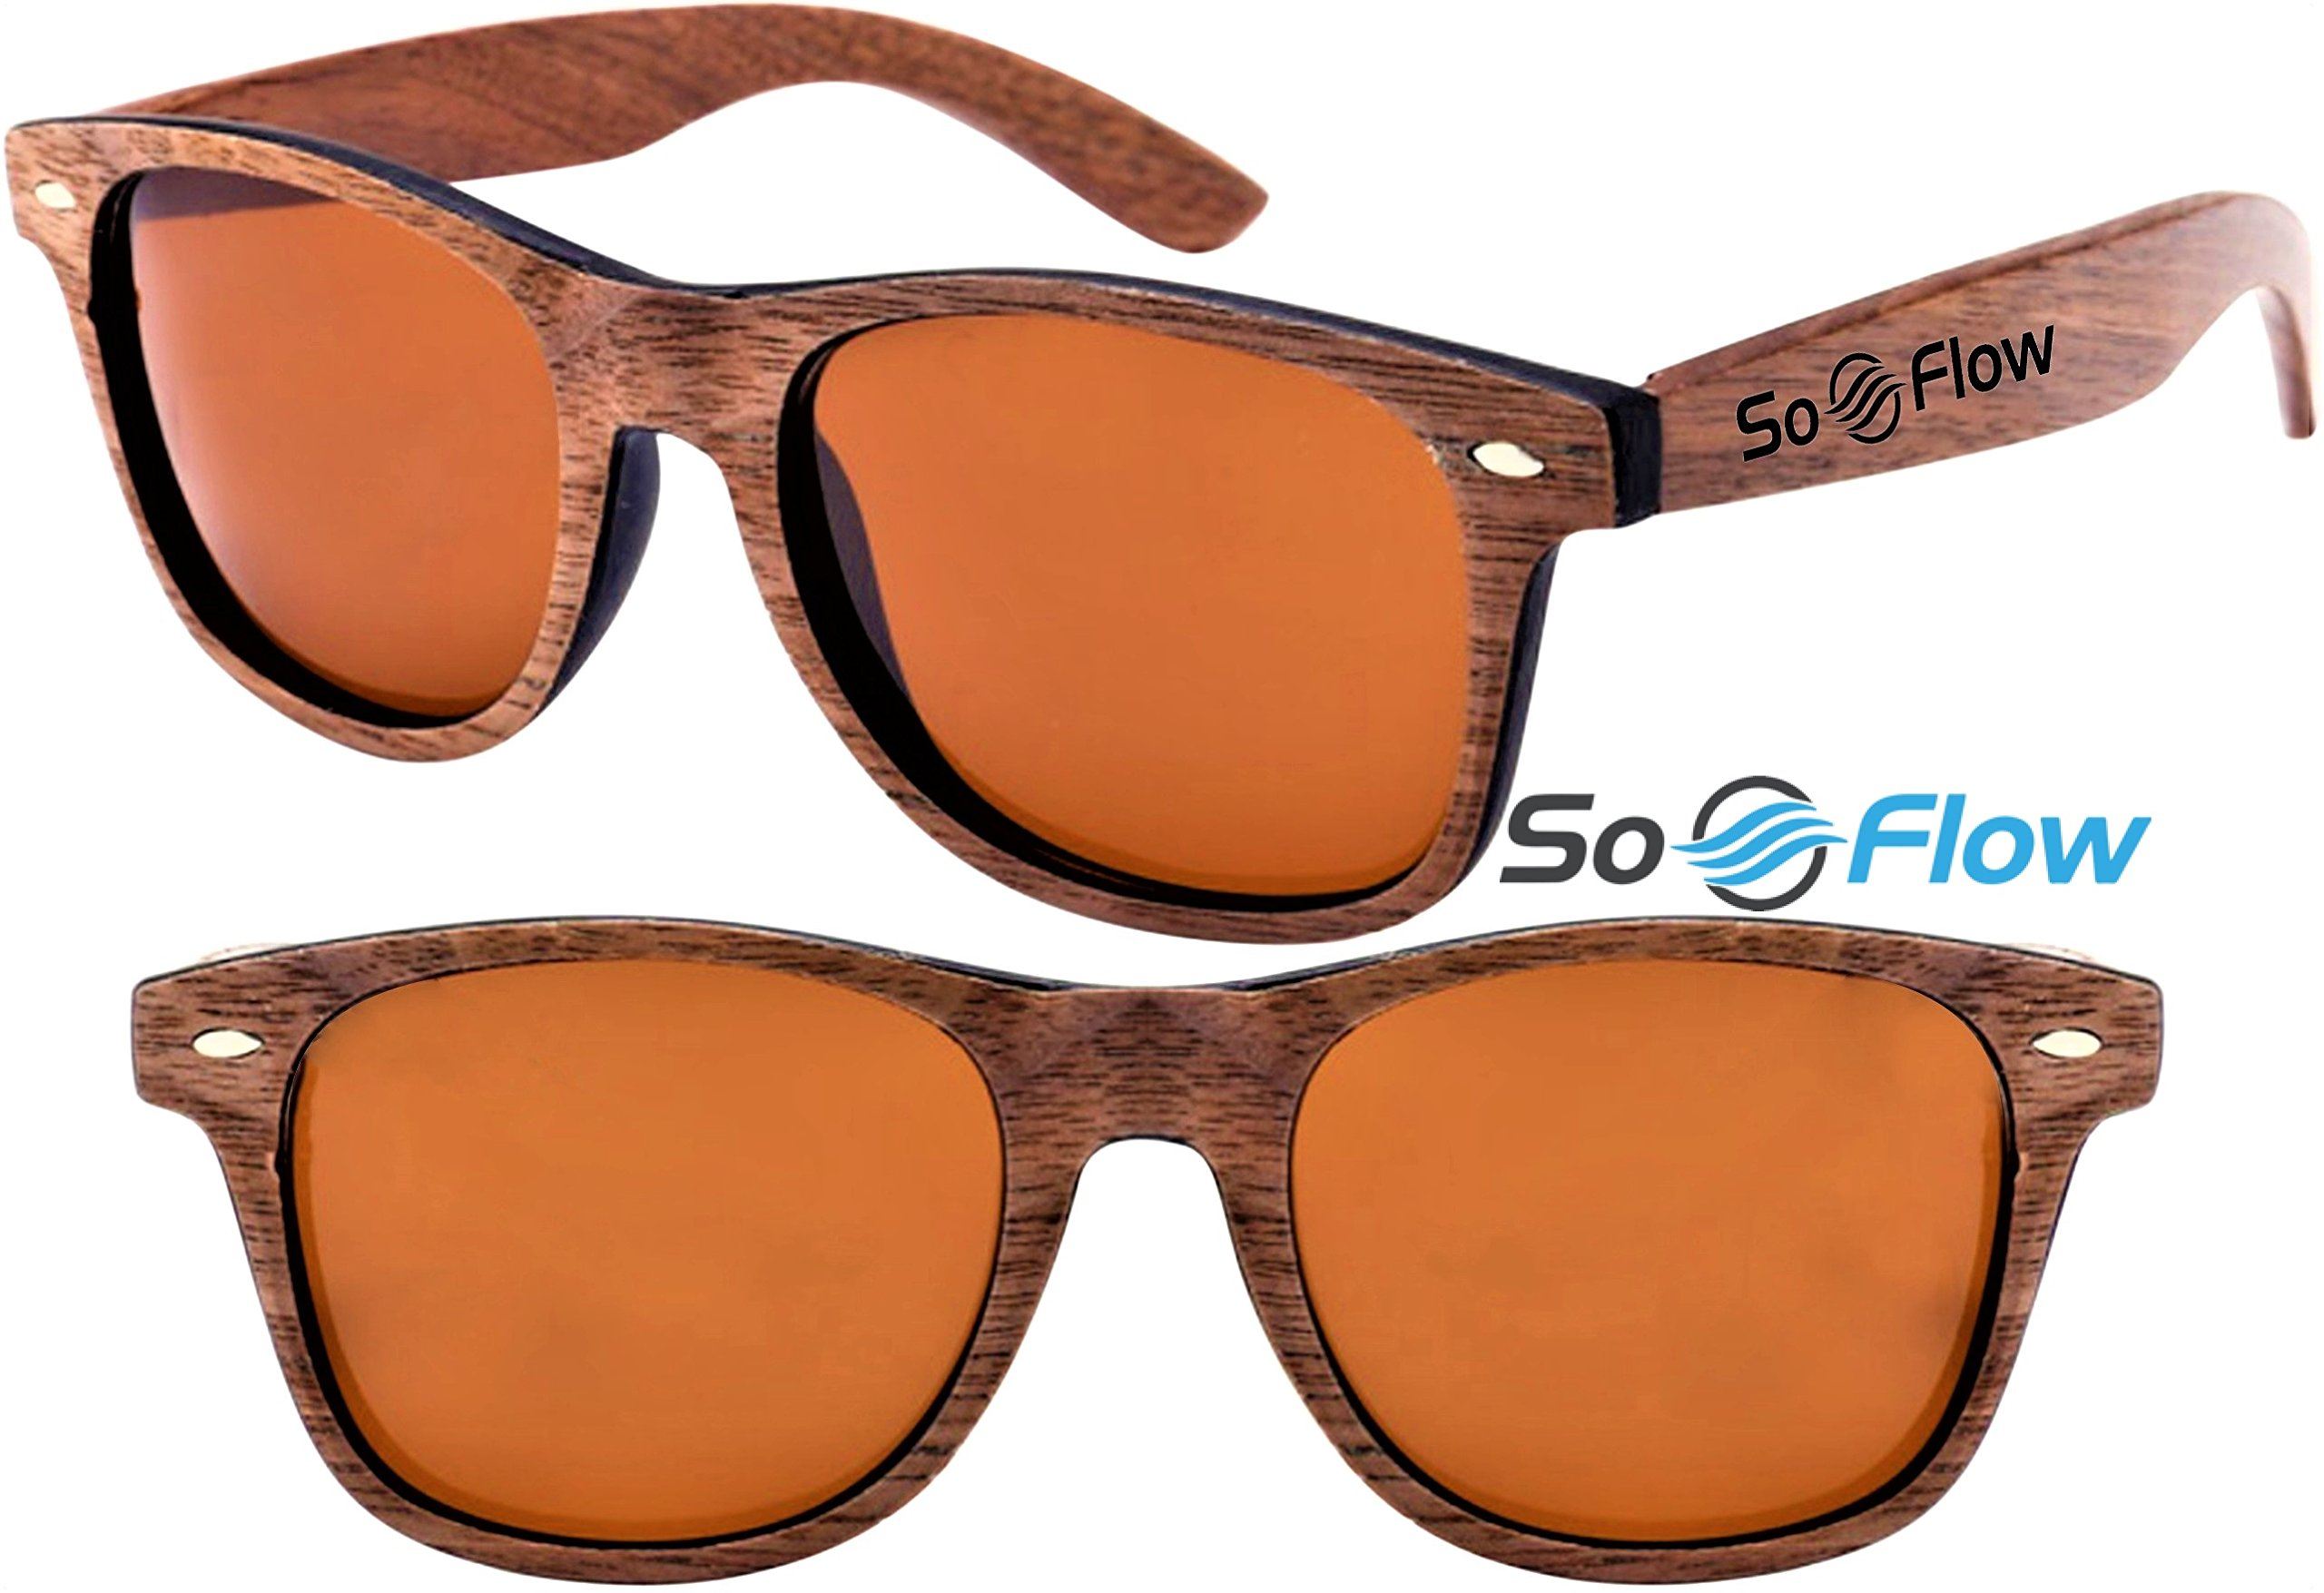 Polarized Brown Walnut Wood Sunglasses - Wooden - Wayfarer - Men - Women - UV400 by SoFlow Sunglasses (Image #2)